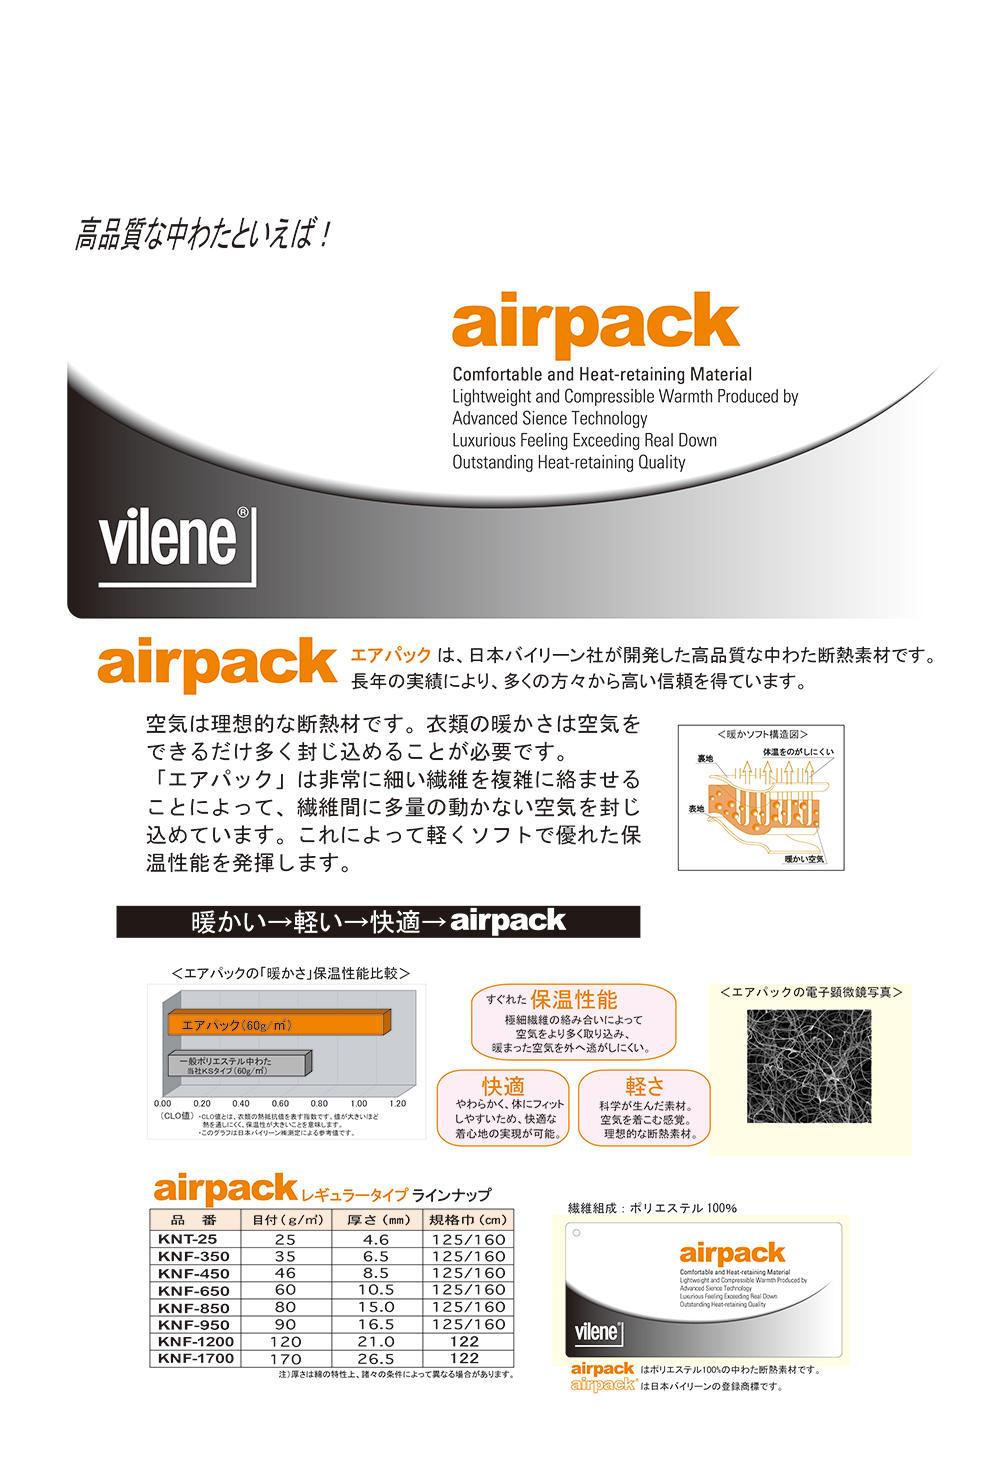 KNF450 中綿 エアパック[芯地] vilene(日本バイリーン)